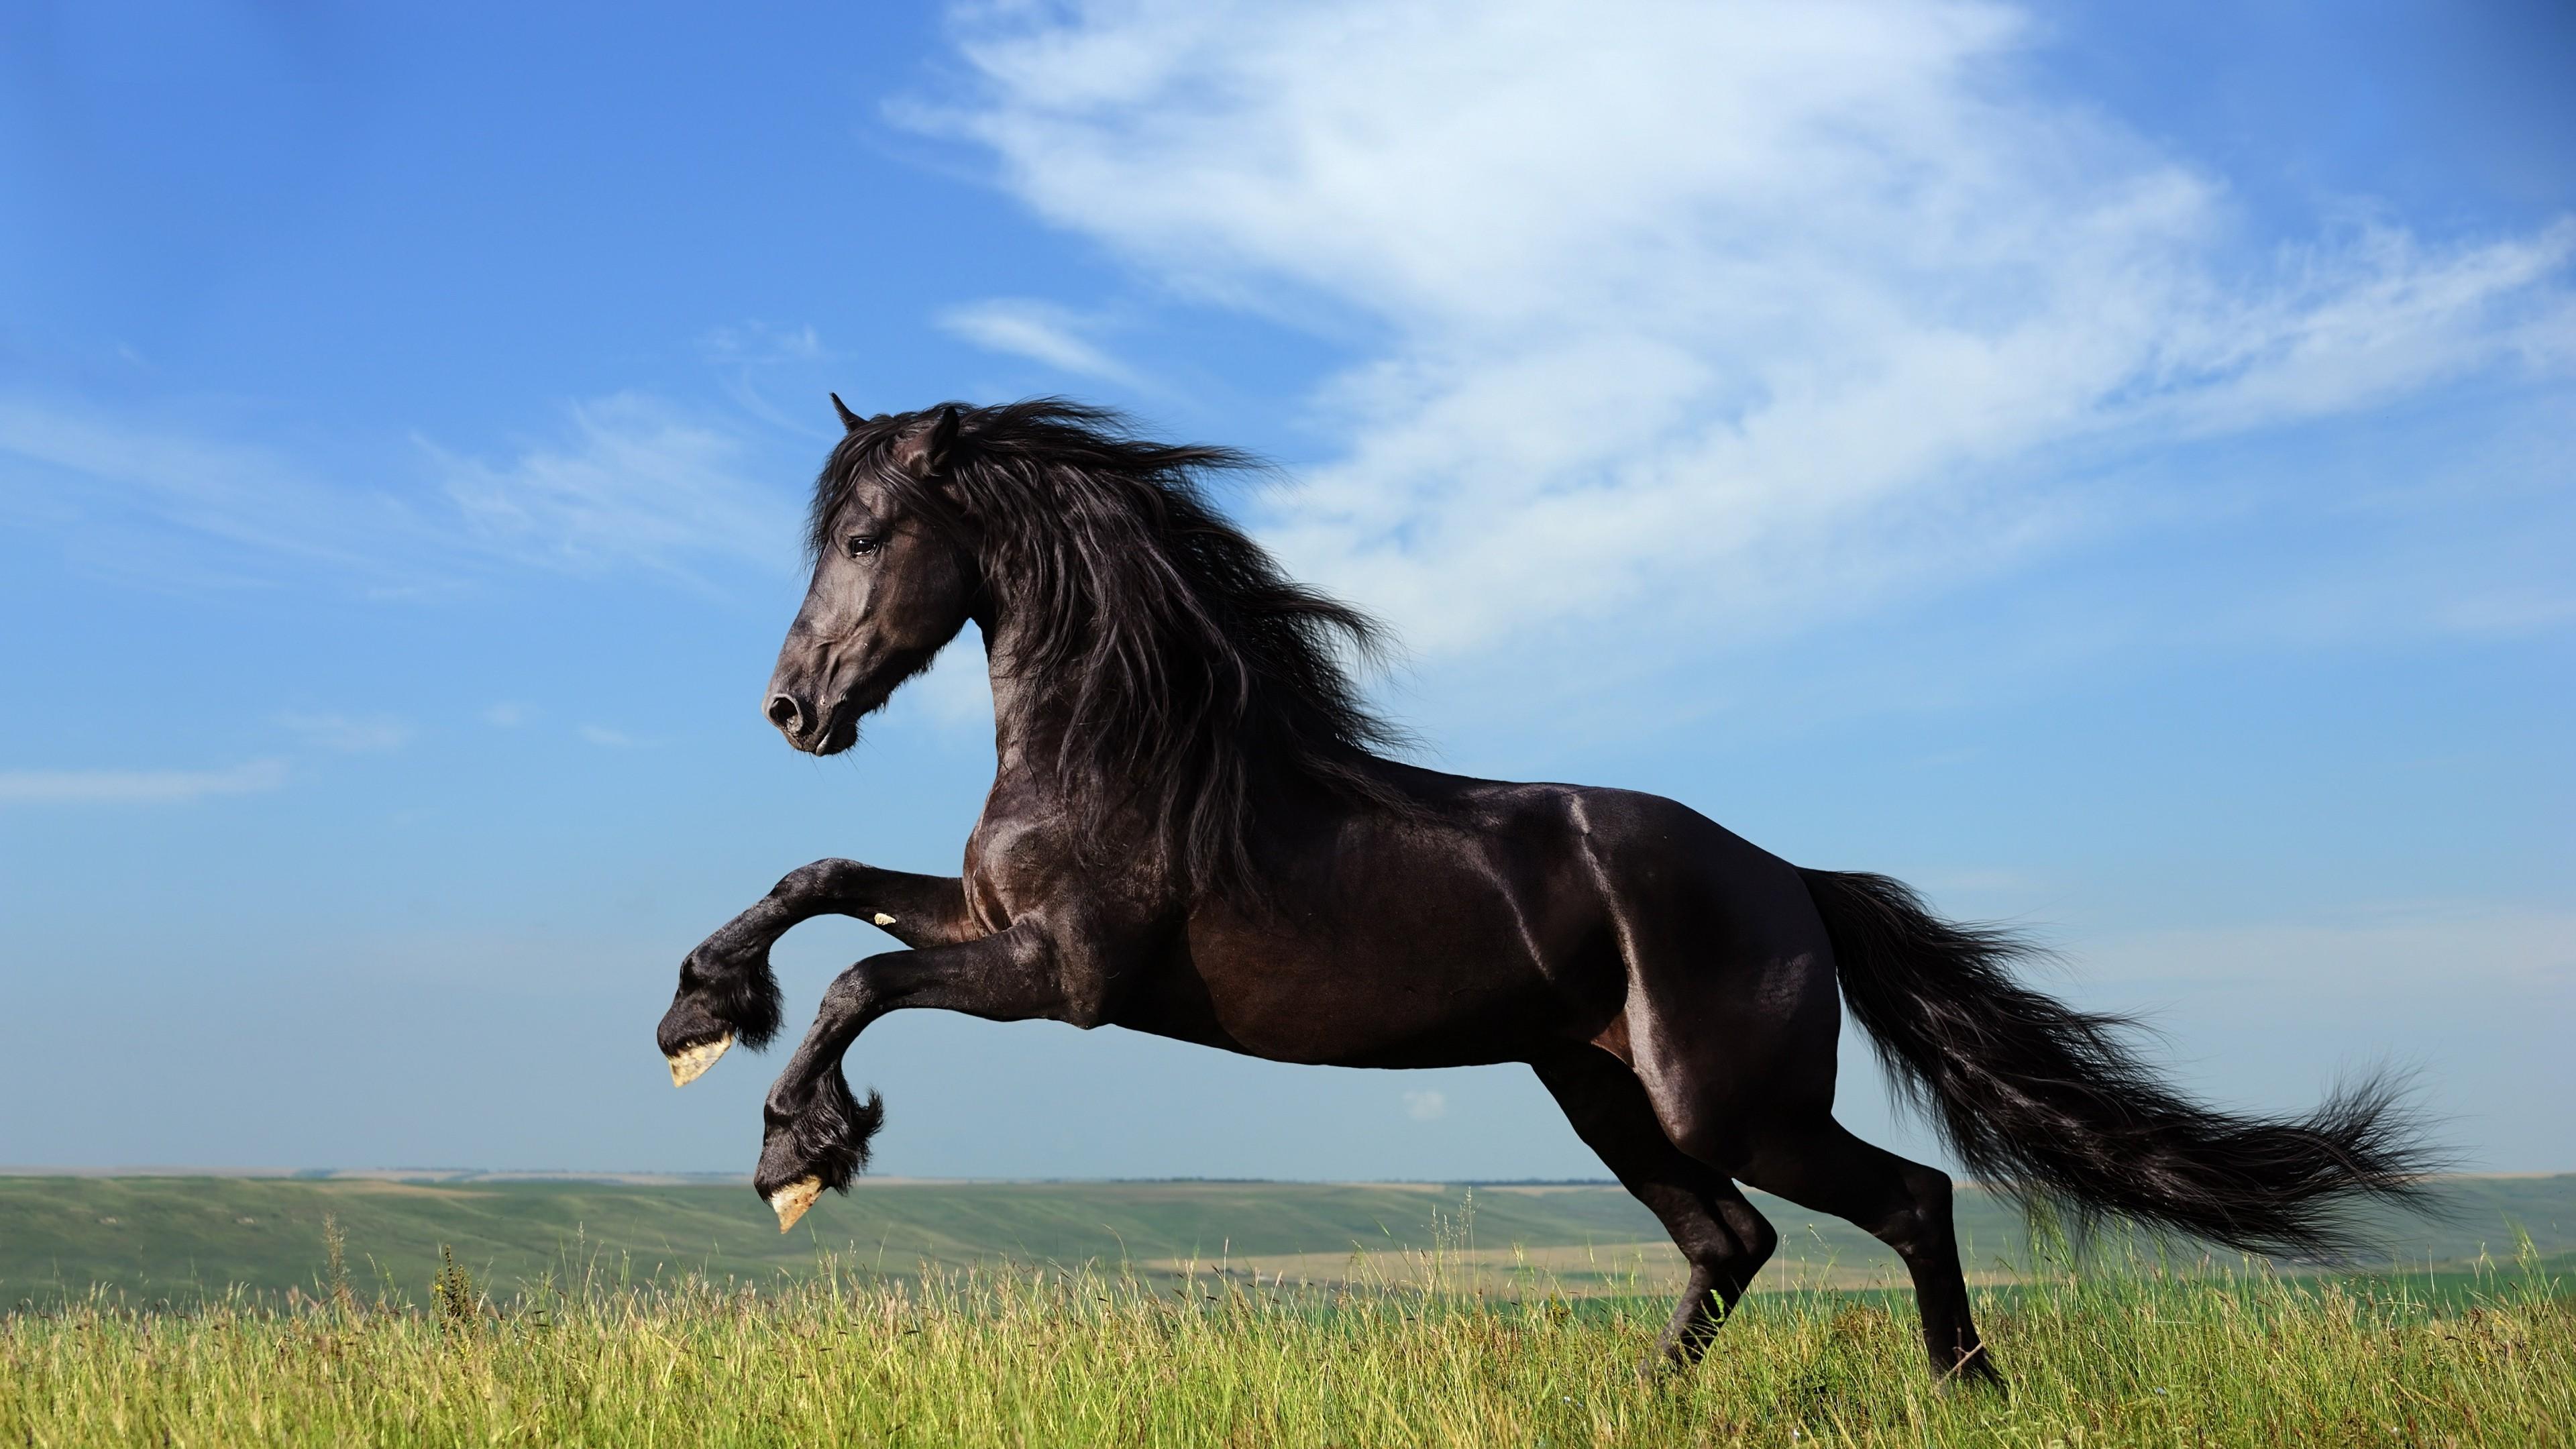 cheval wallpaper hd 1 - photo #46